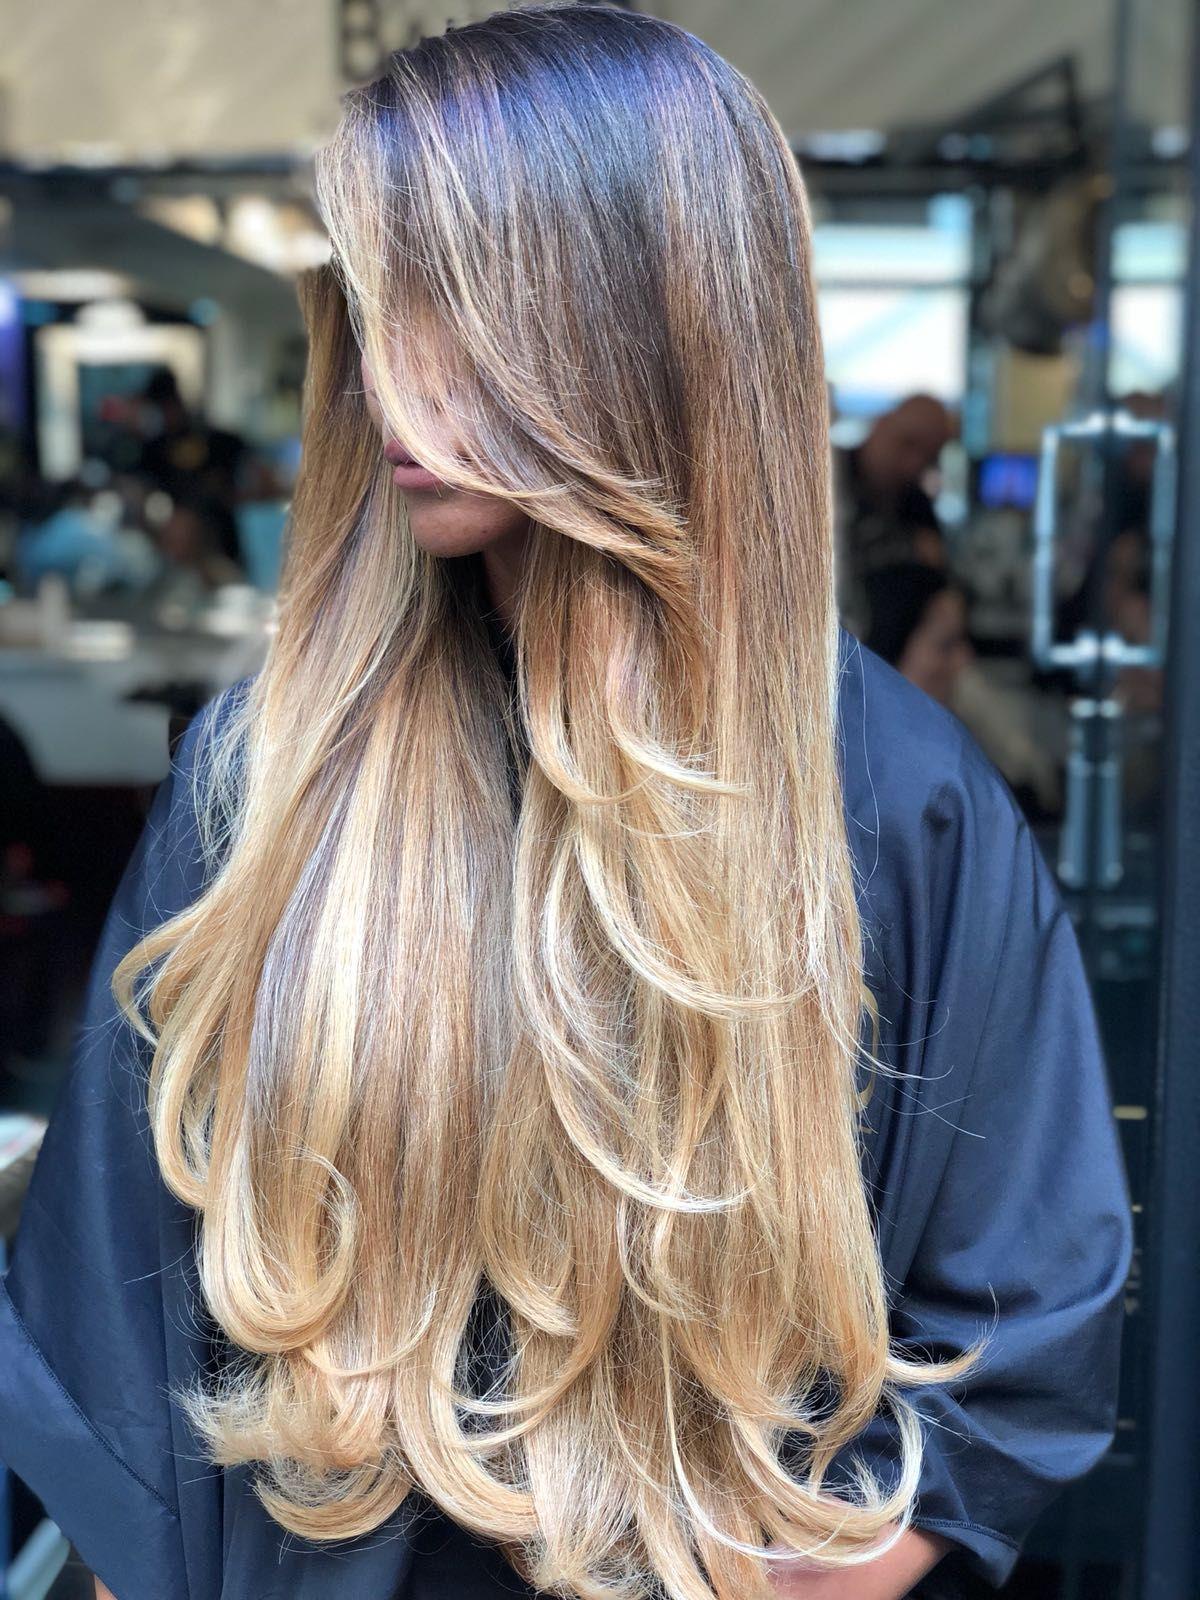 Pin By Balato Hair Makeup On Hair Long Hair Styles Blonde Hair Hair